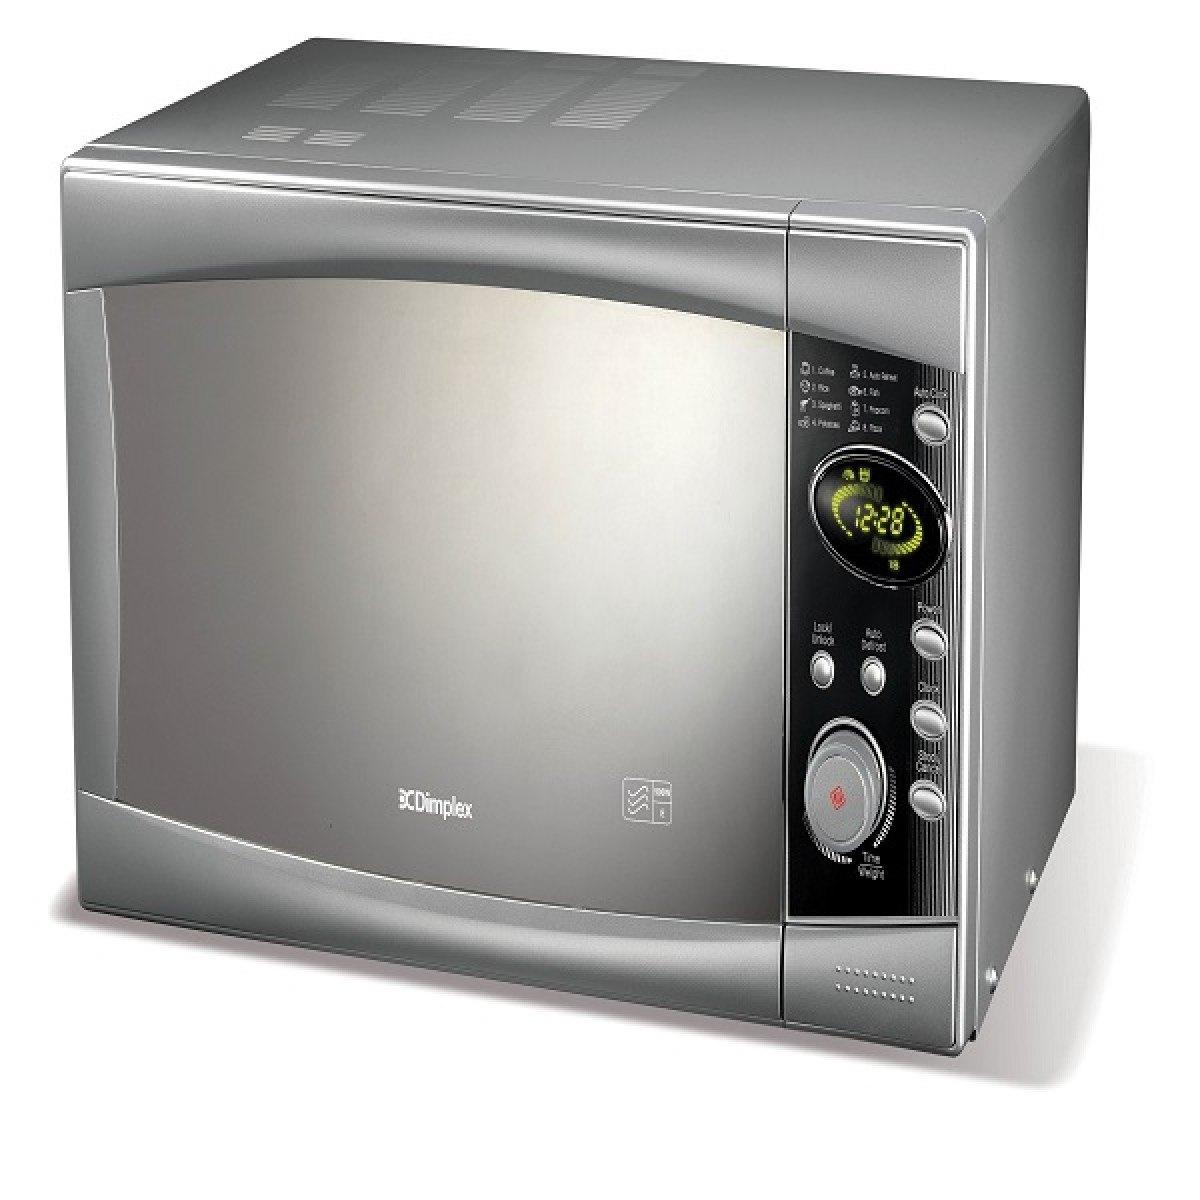 dimplex microwave 900w 23l silver. Black Bedroom Furniture Sets. Home Design Ideas